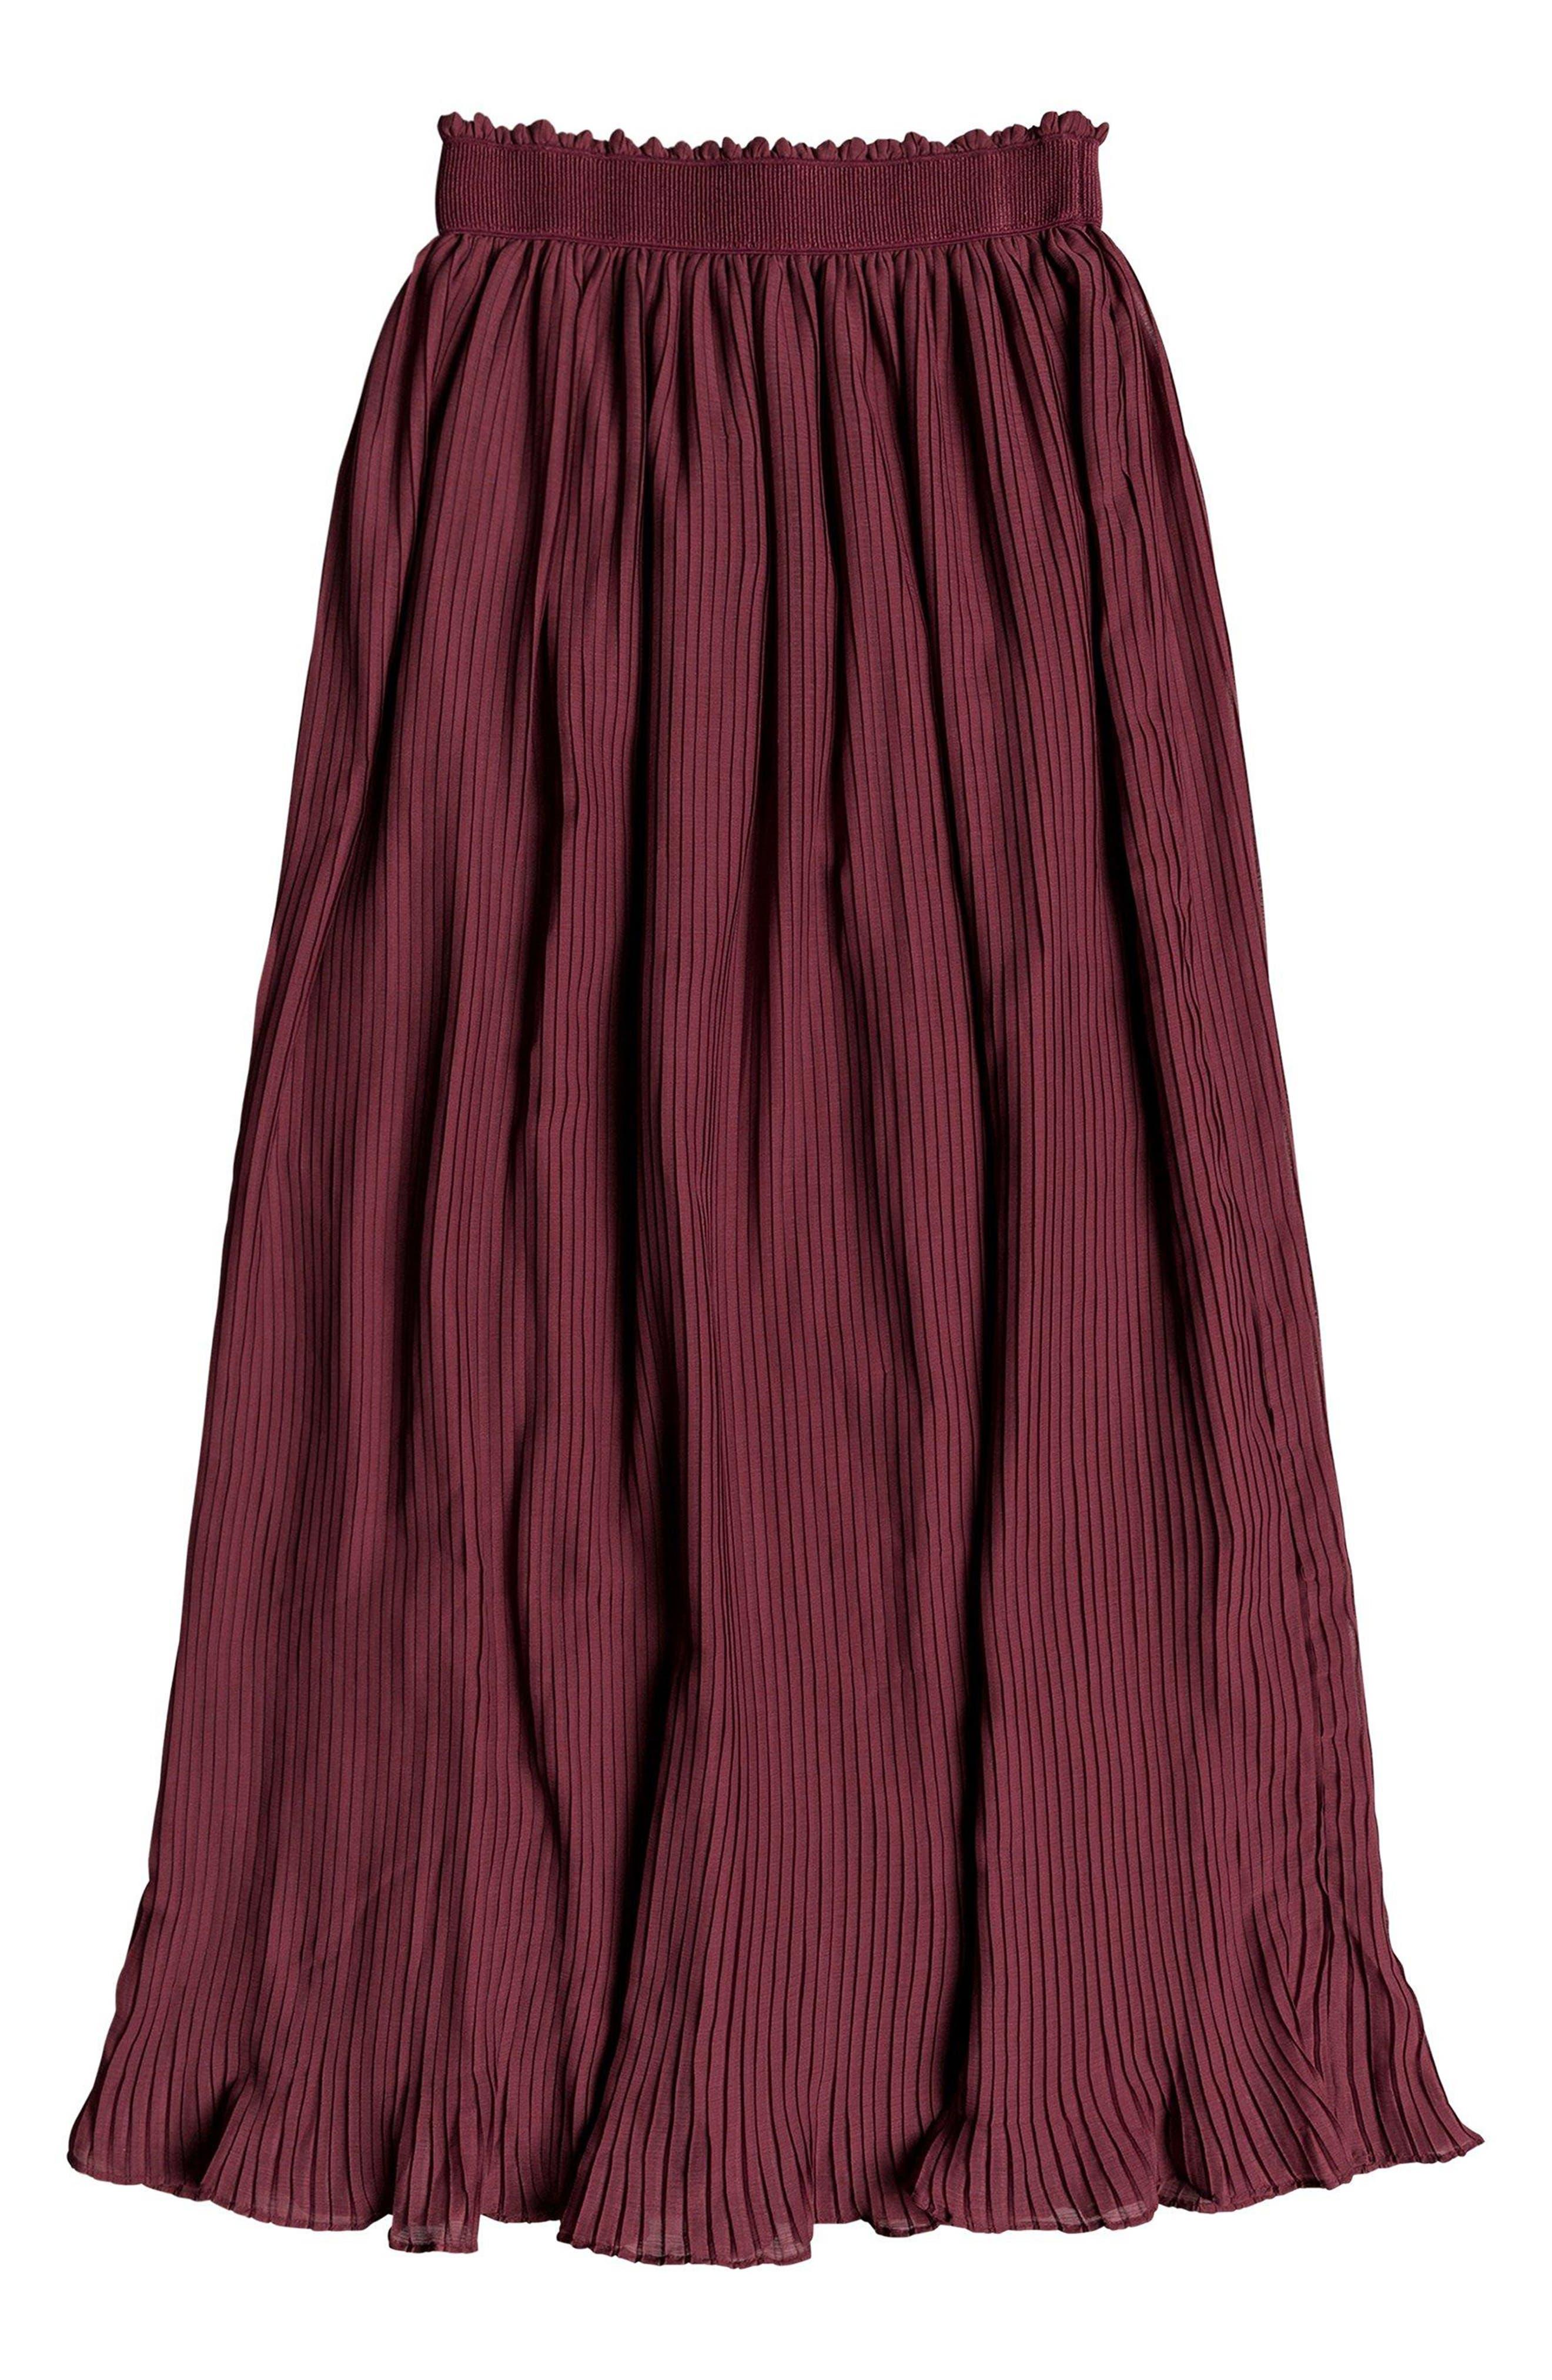 ROXY,                             Green Canyon Midi Skirt,                             Alternate thumbnail 4, color,                             OXBLOOD RED